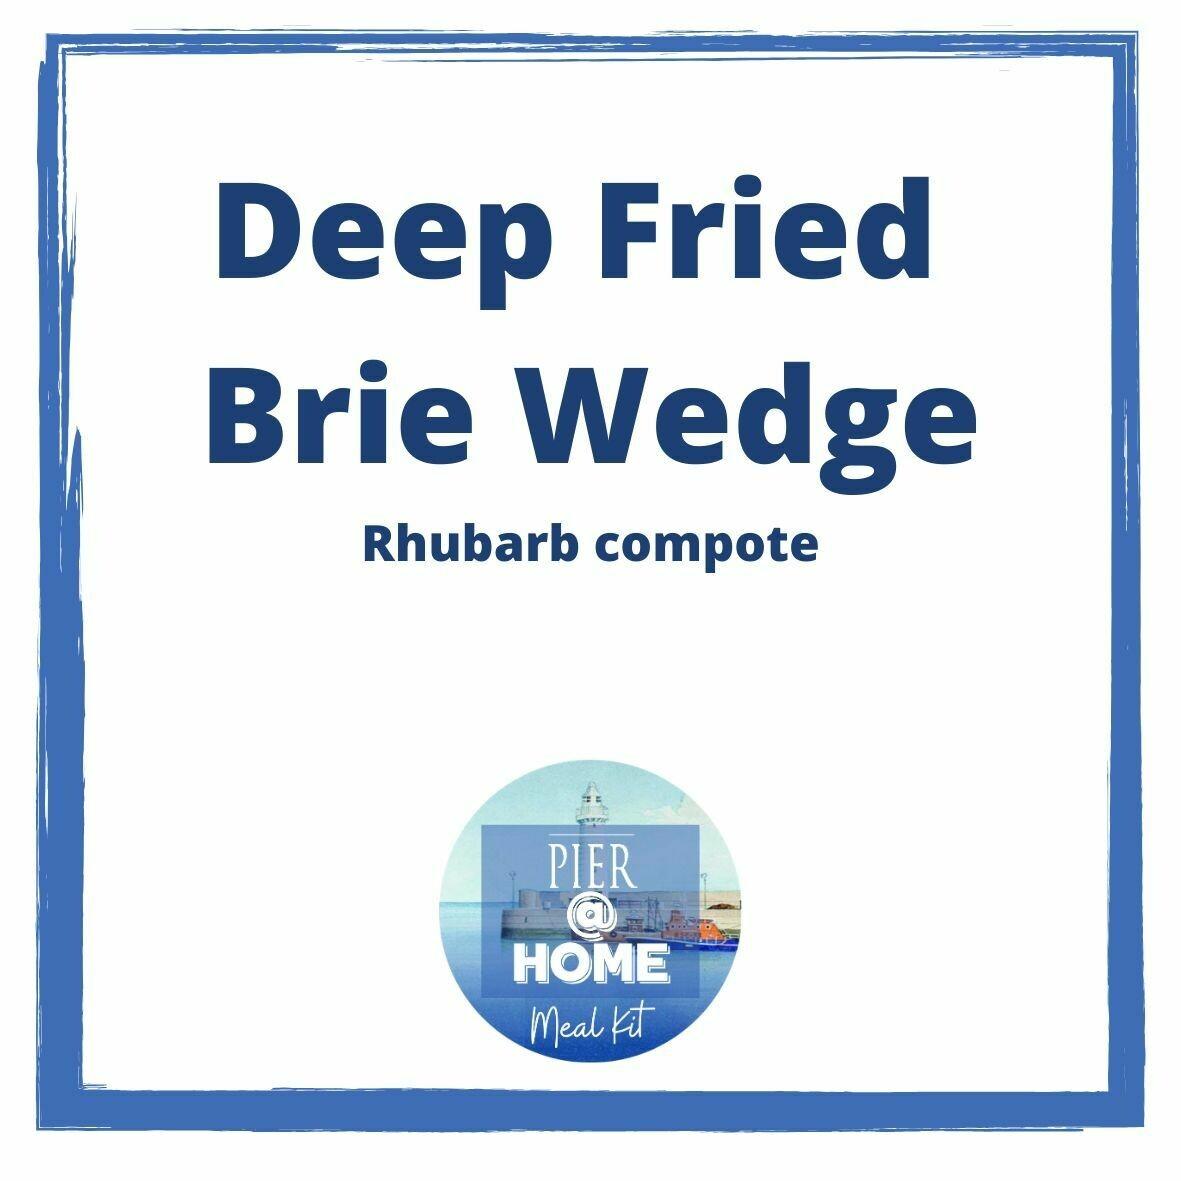 Brie Wedge & Rhubarb Compote